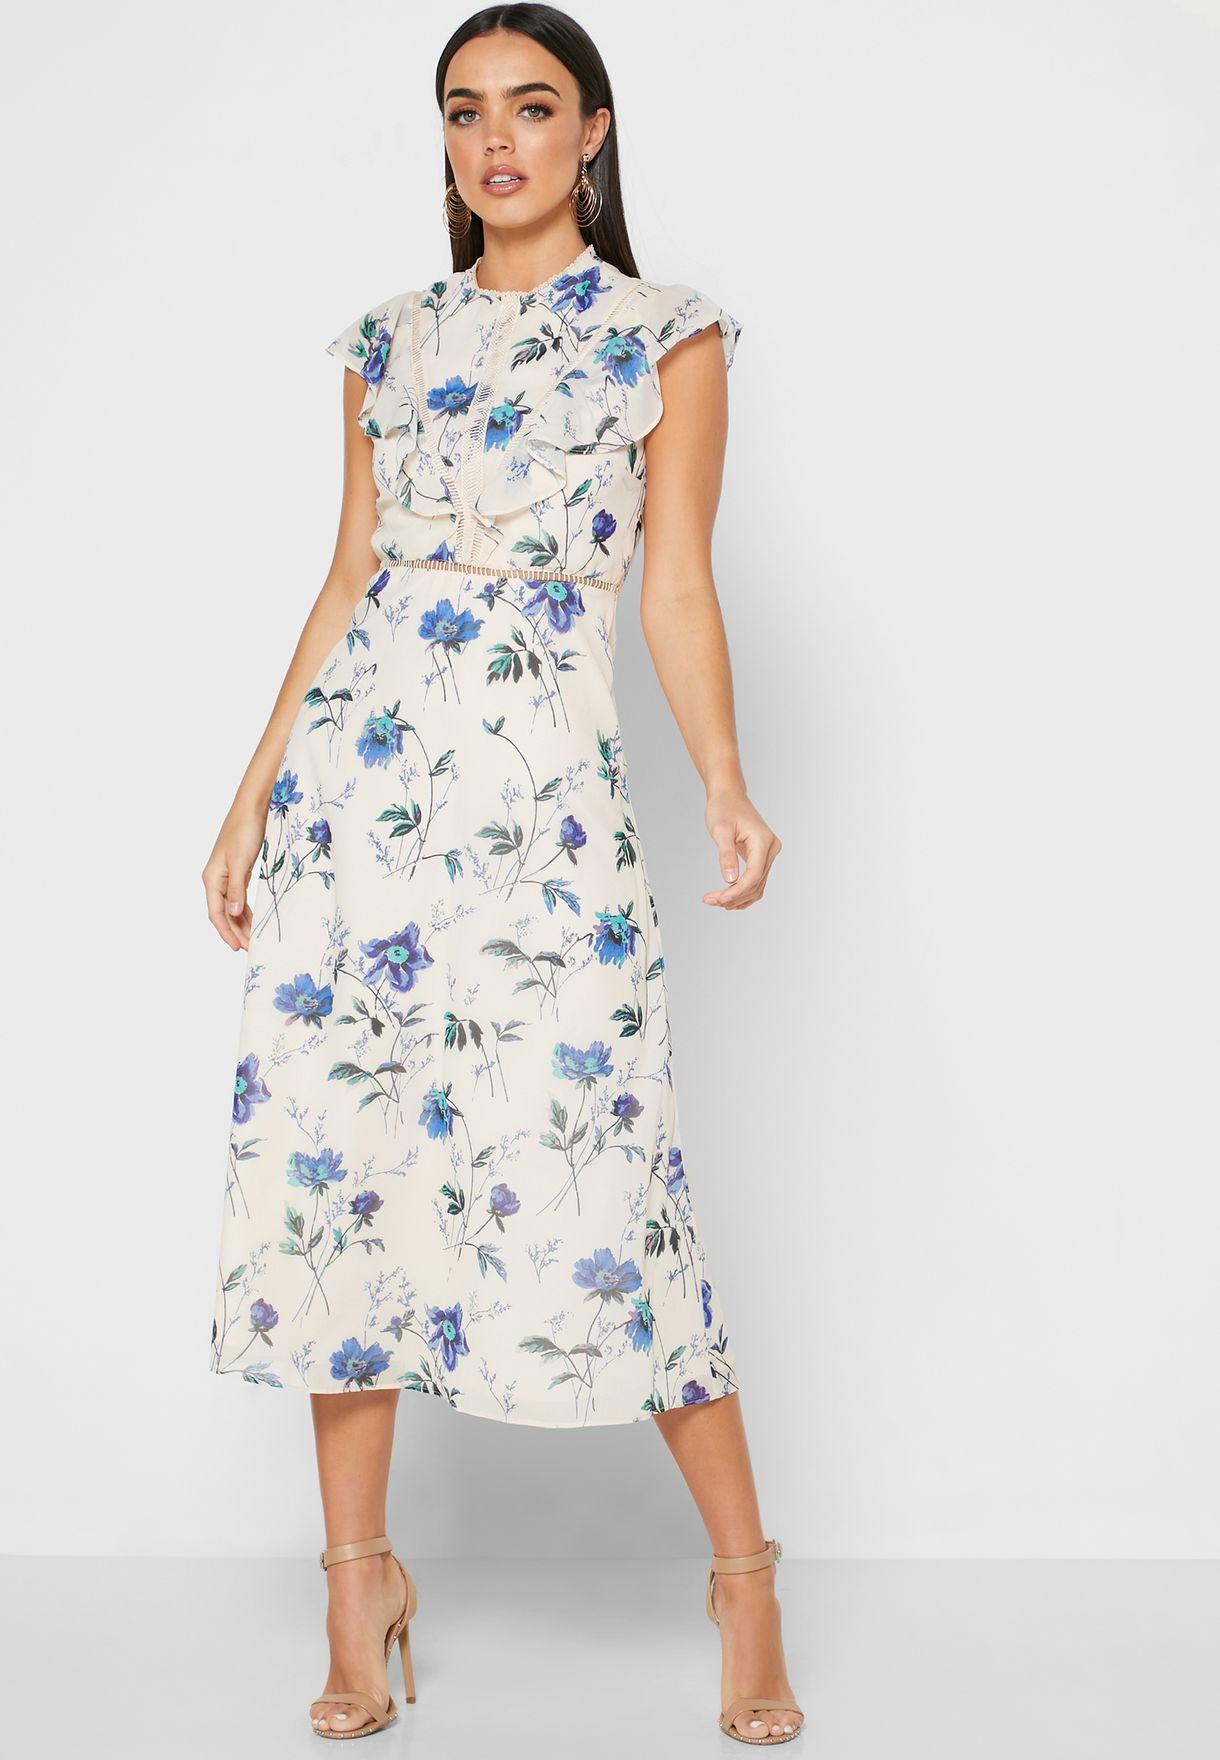 Cape Sleeve Floral Print Dress